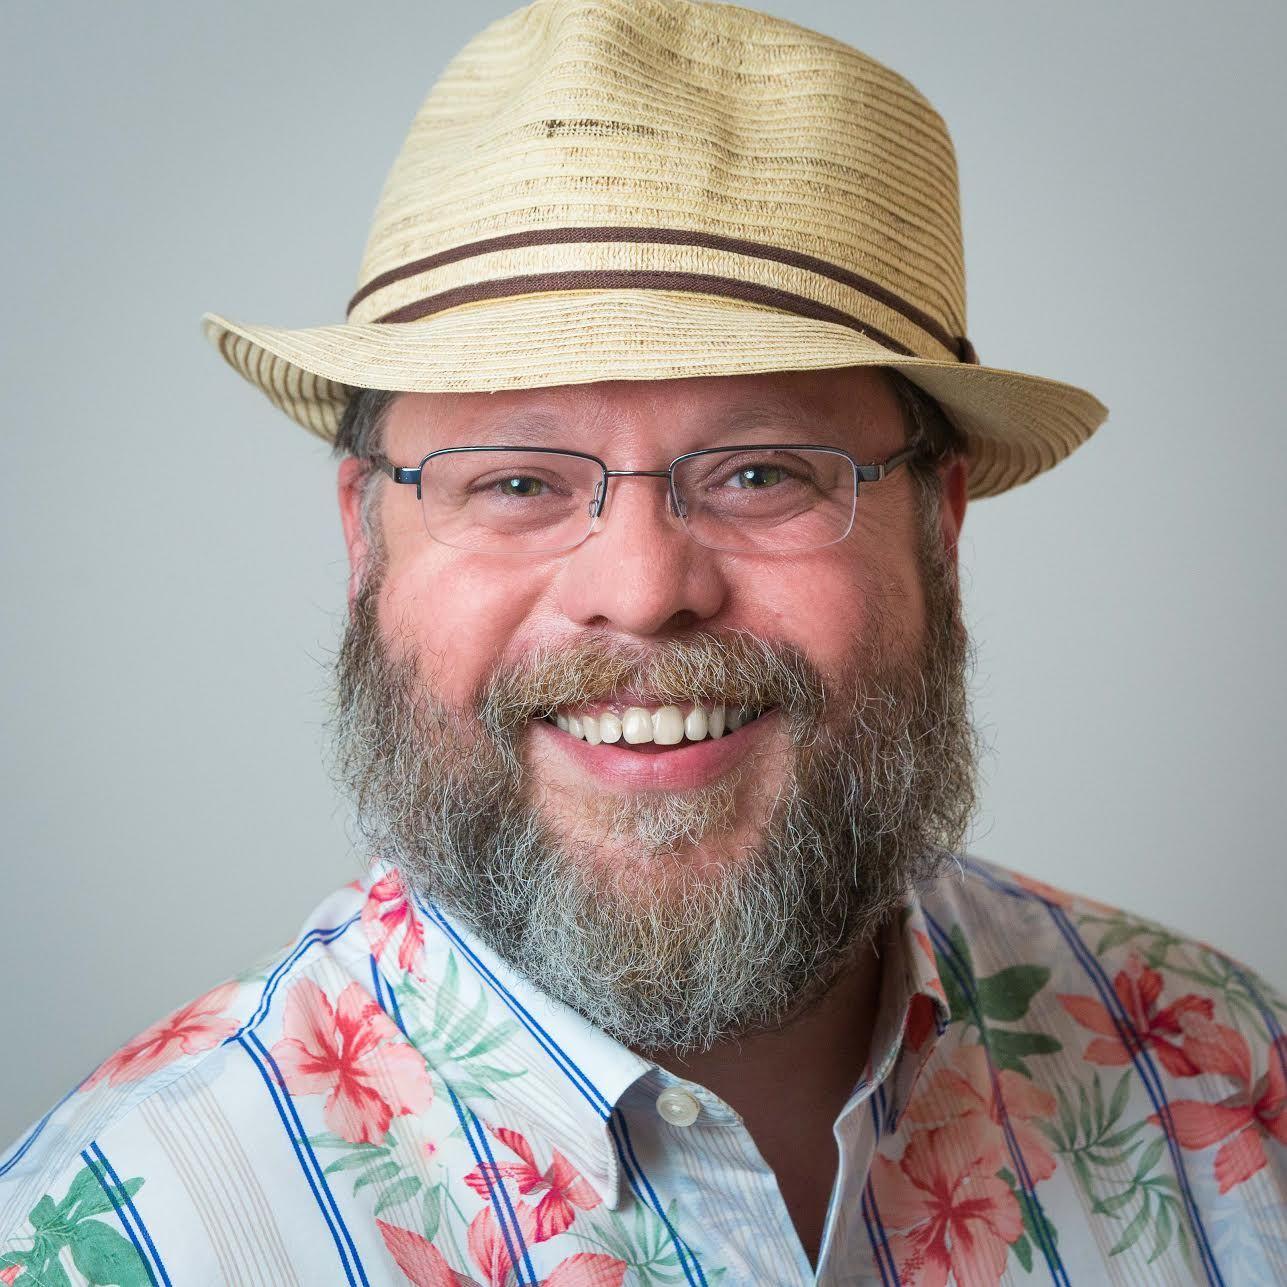 Jason D. Straughan